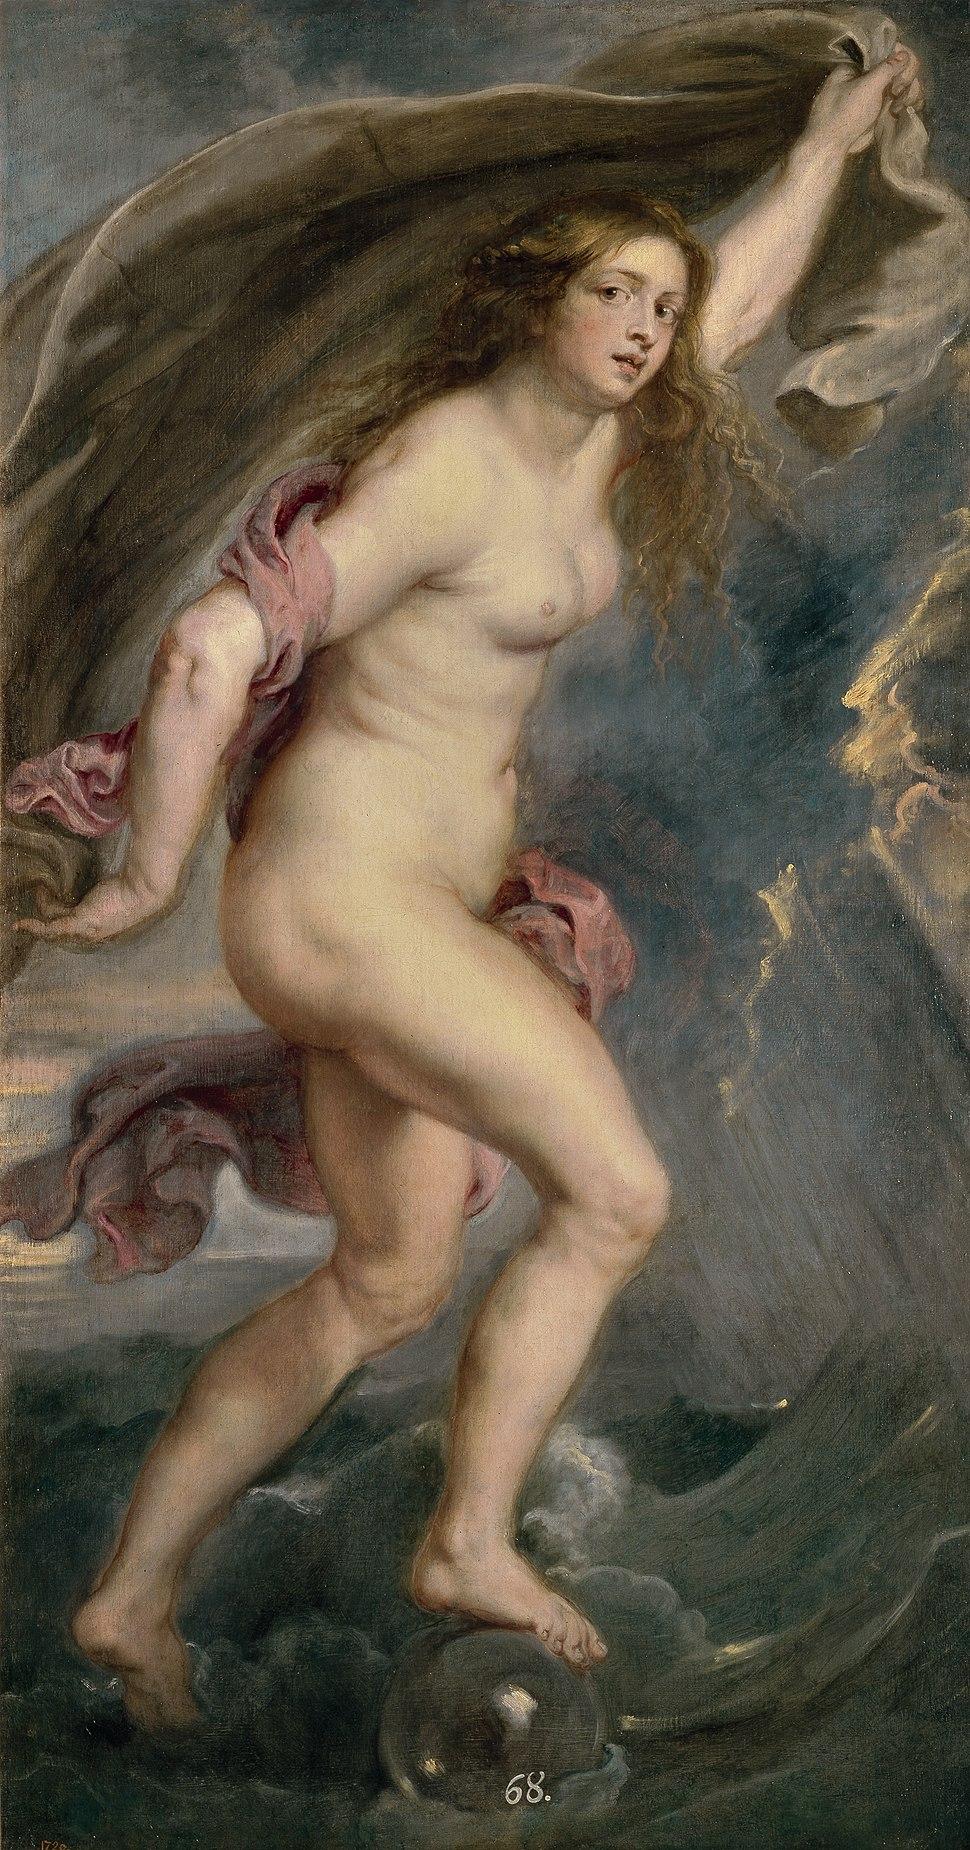 Peter Paul Rubens - Fortuna, 1638